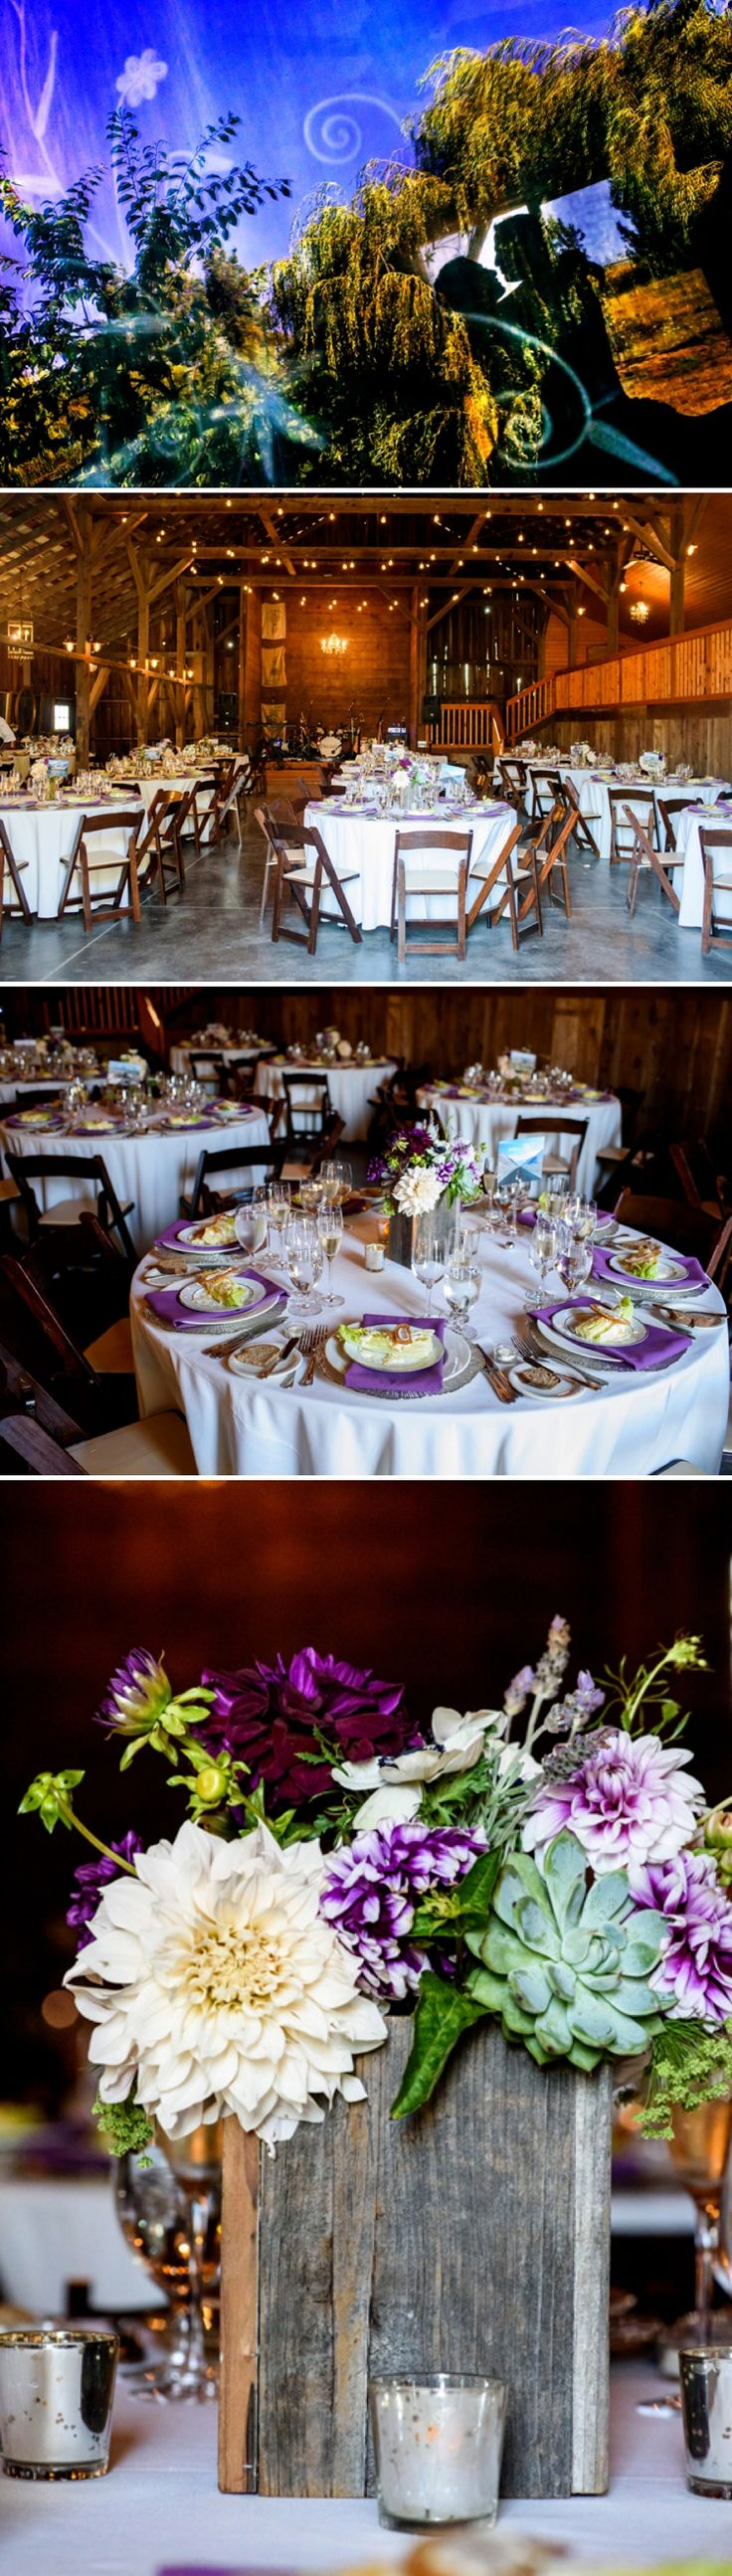 Purple and lavander / Getting married in a barn / Rustic atmosphere / A Vera Wang Bride / a Jewish travel-themed barn wedding / at Olympia's Valley Estate, Petaluma, California, USA / Photography by Chrisman Studios / http://www.smashingtheglass.com/2016/08/02/vera-wang-bride-jewish-travel-themed-barn-wedding-olympias-valley-estate-petaluma-california-usa/